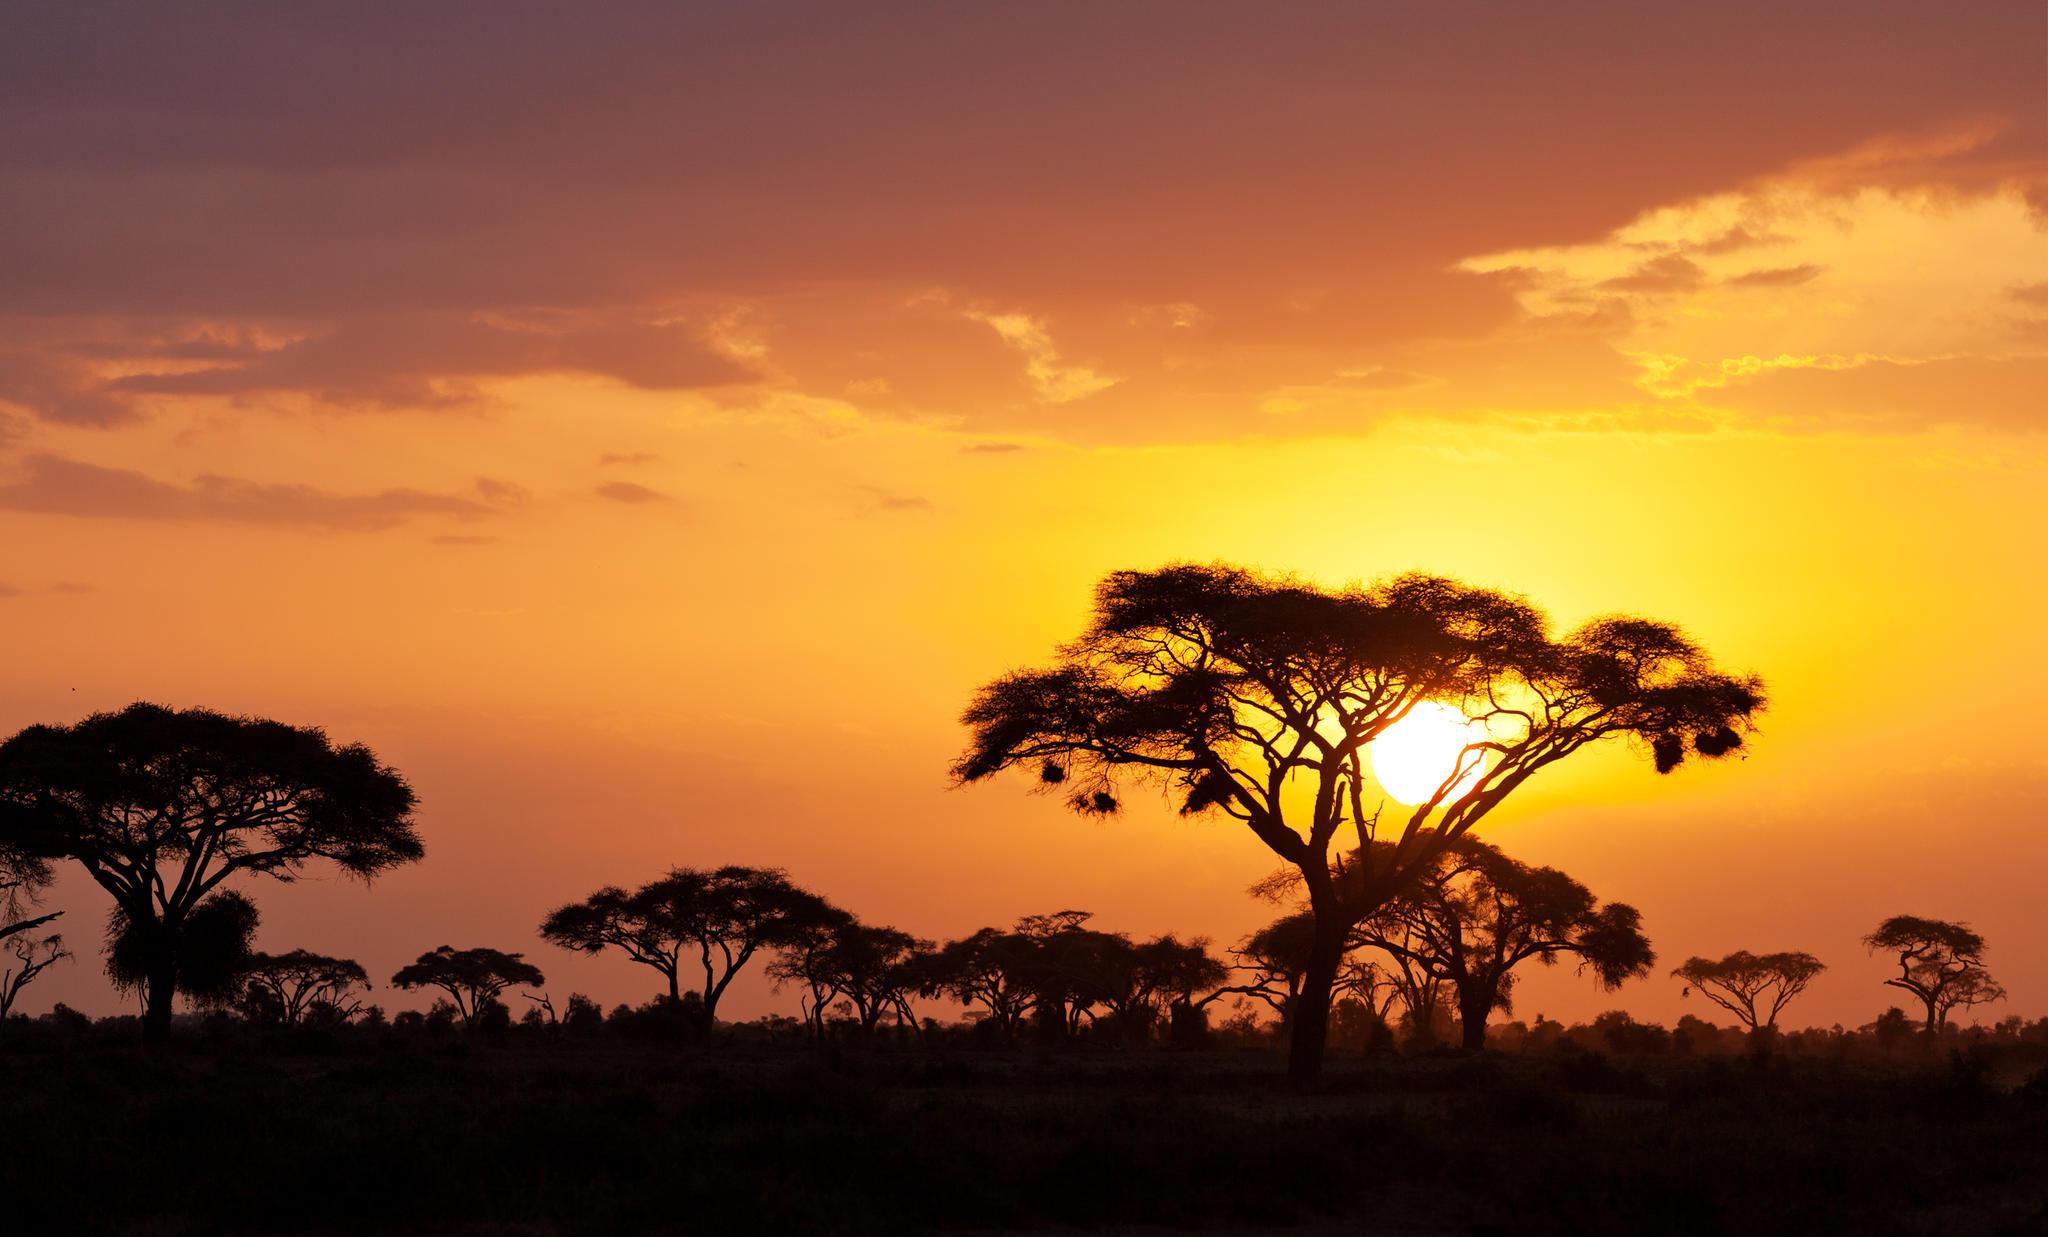 Sonnenuntergang in Kenia, Afrika